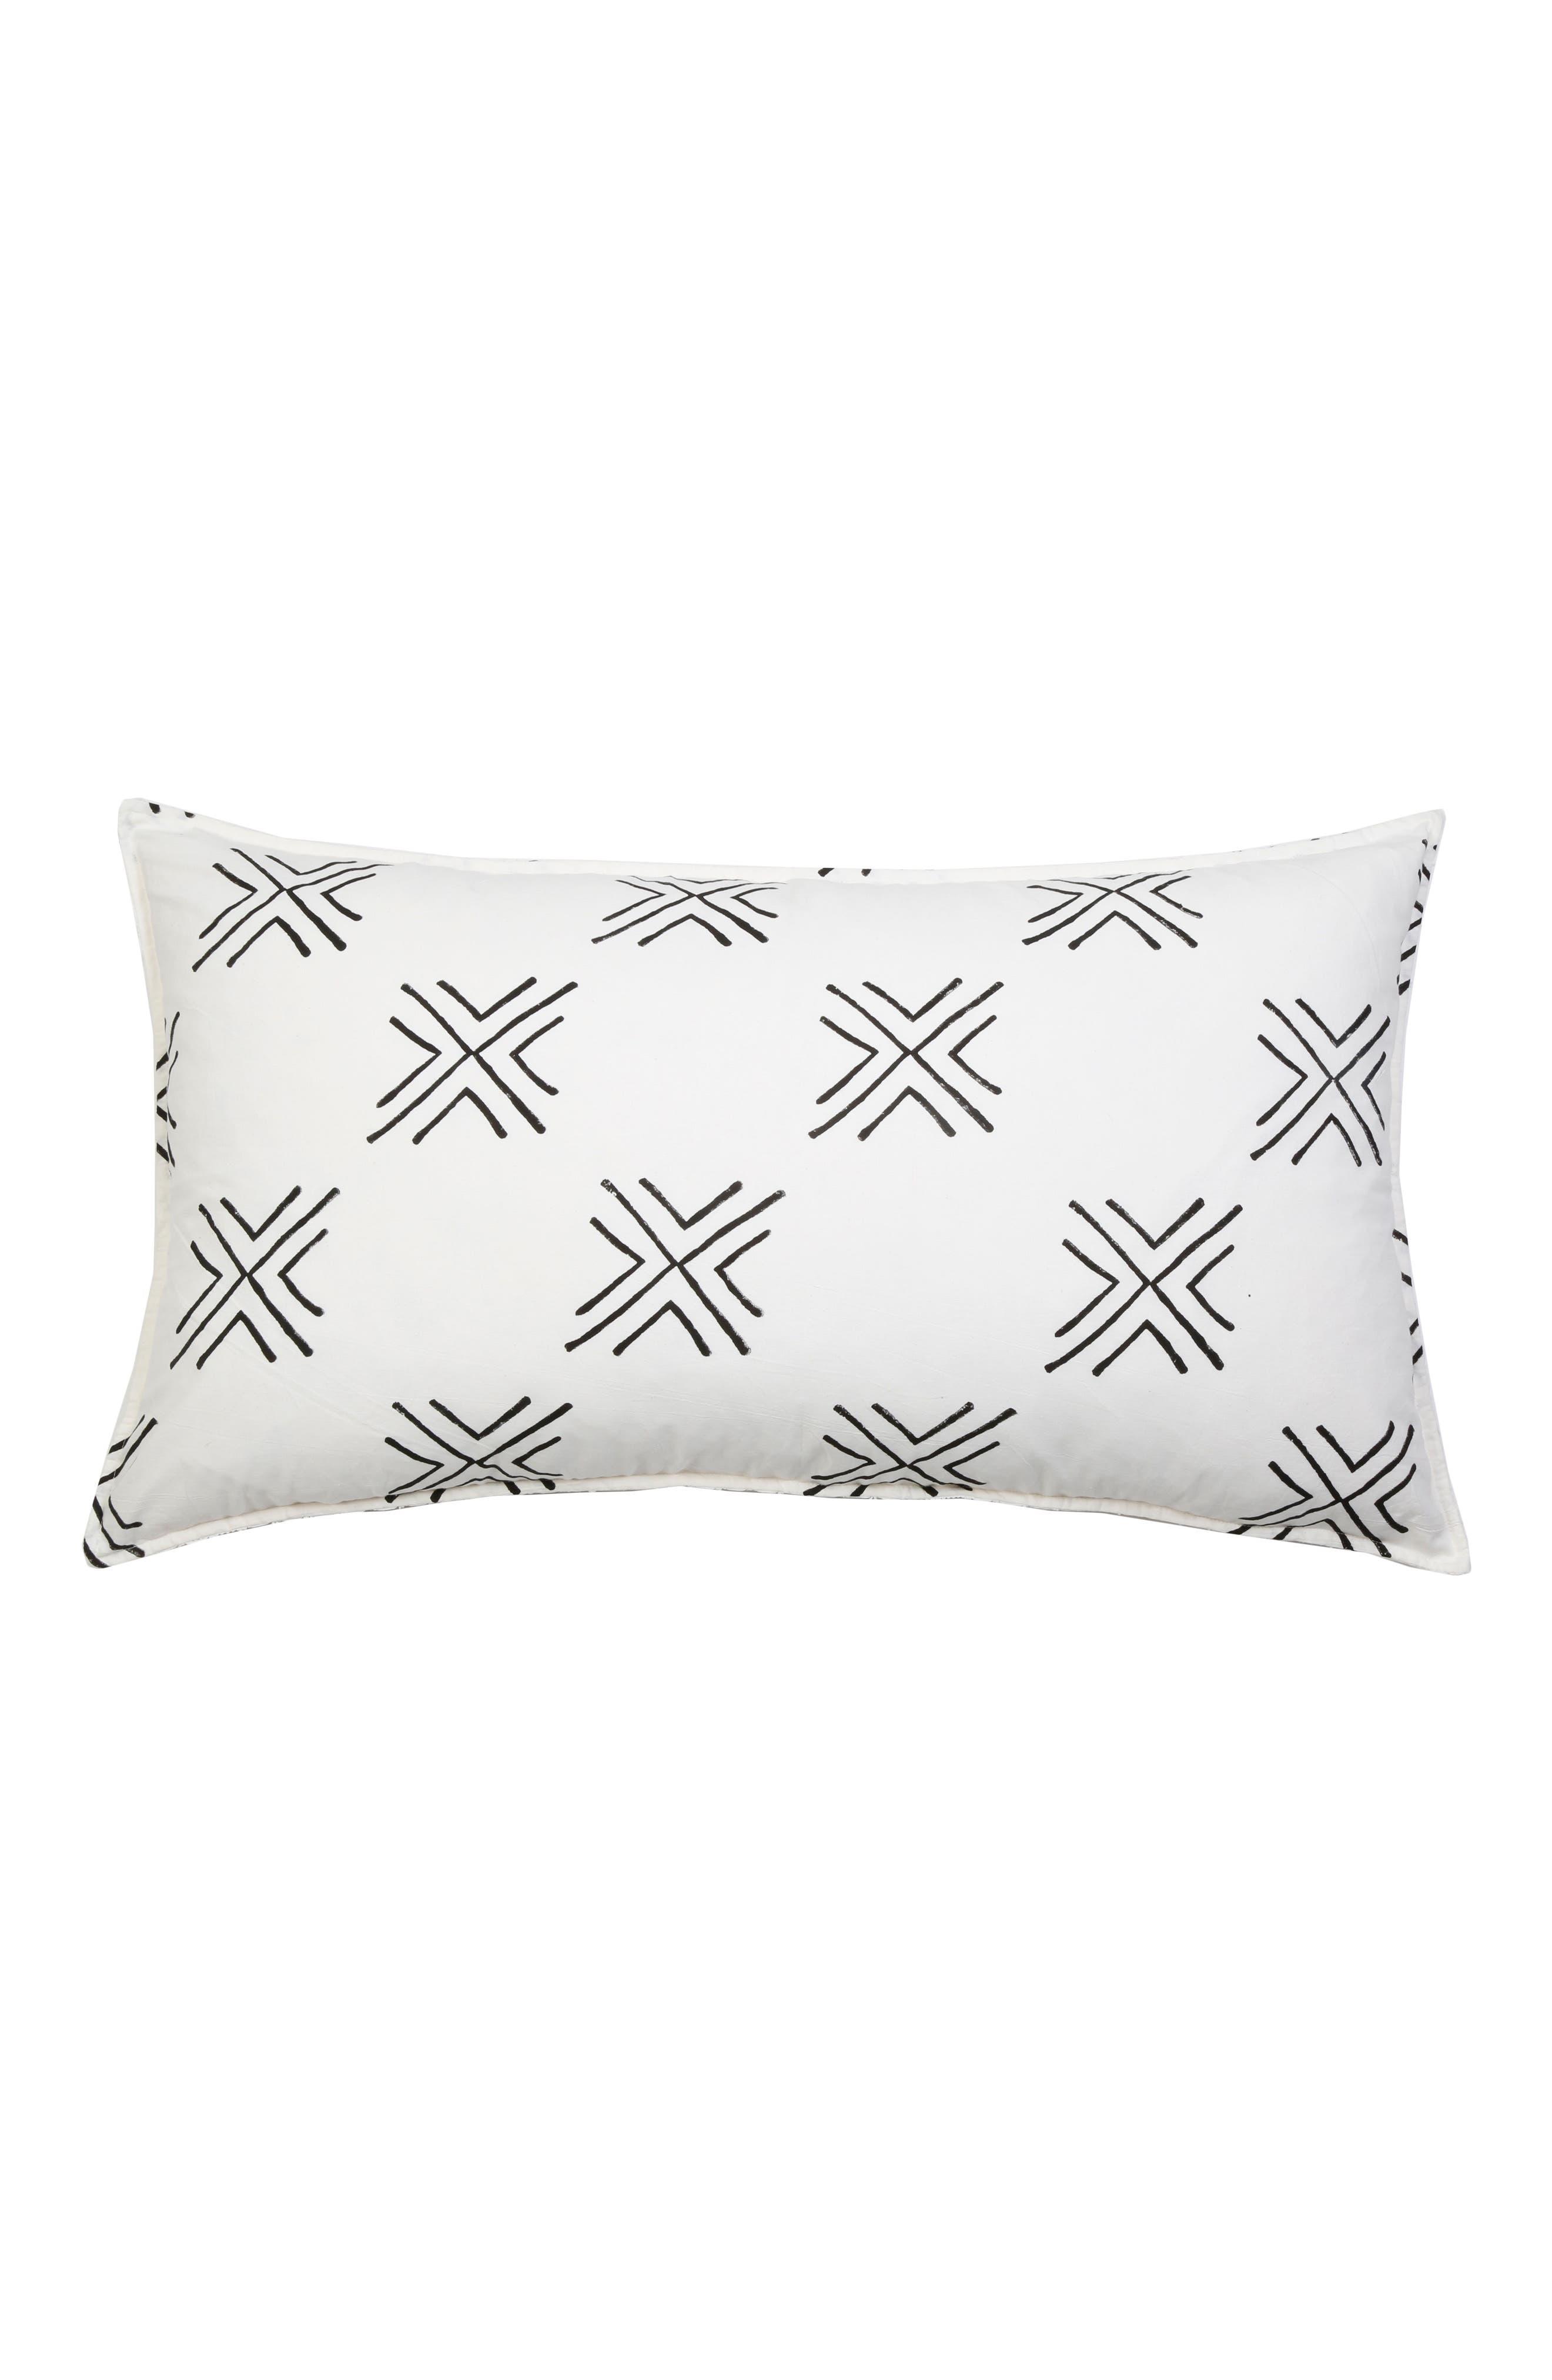 Arrow Accent Pillow,                         Main,                         color, White Multi